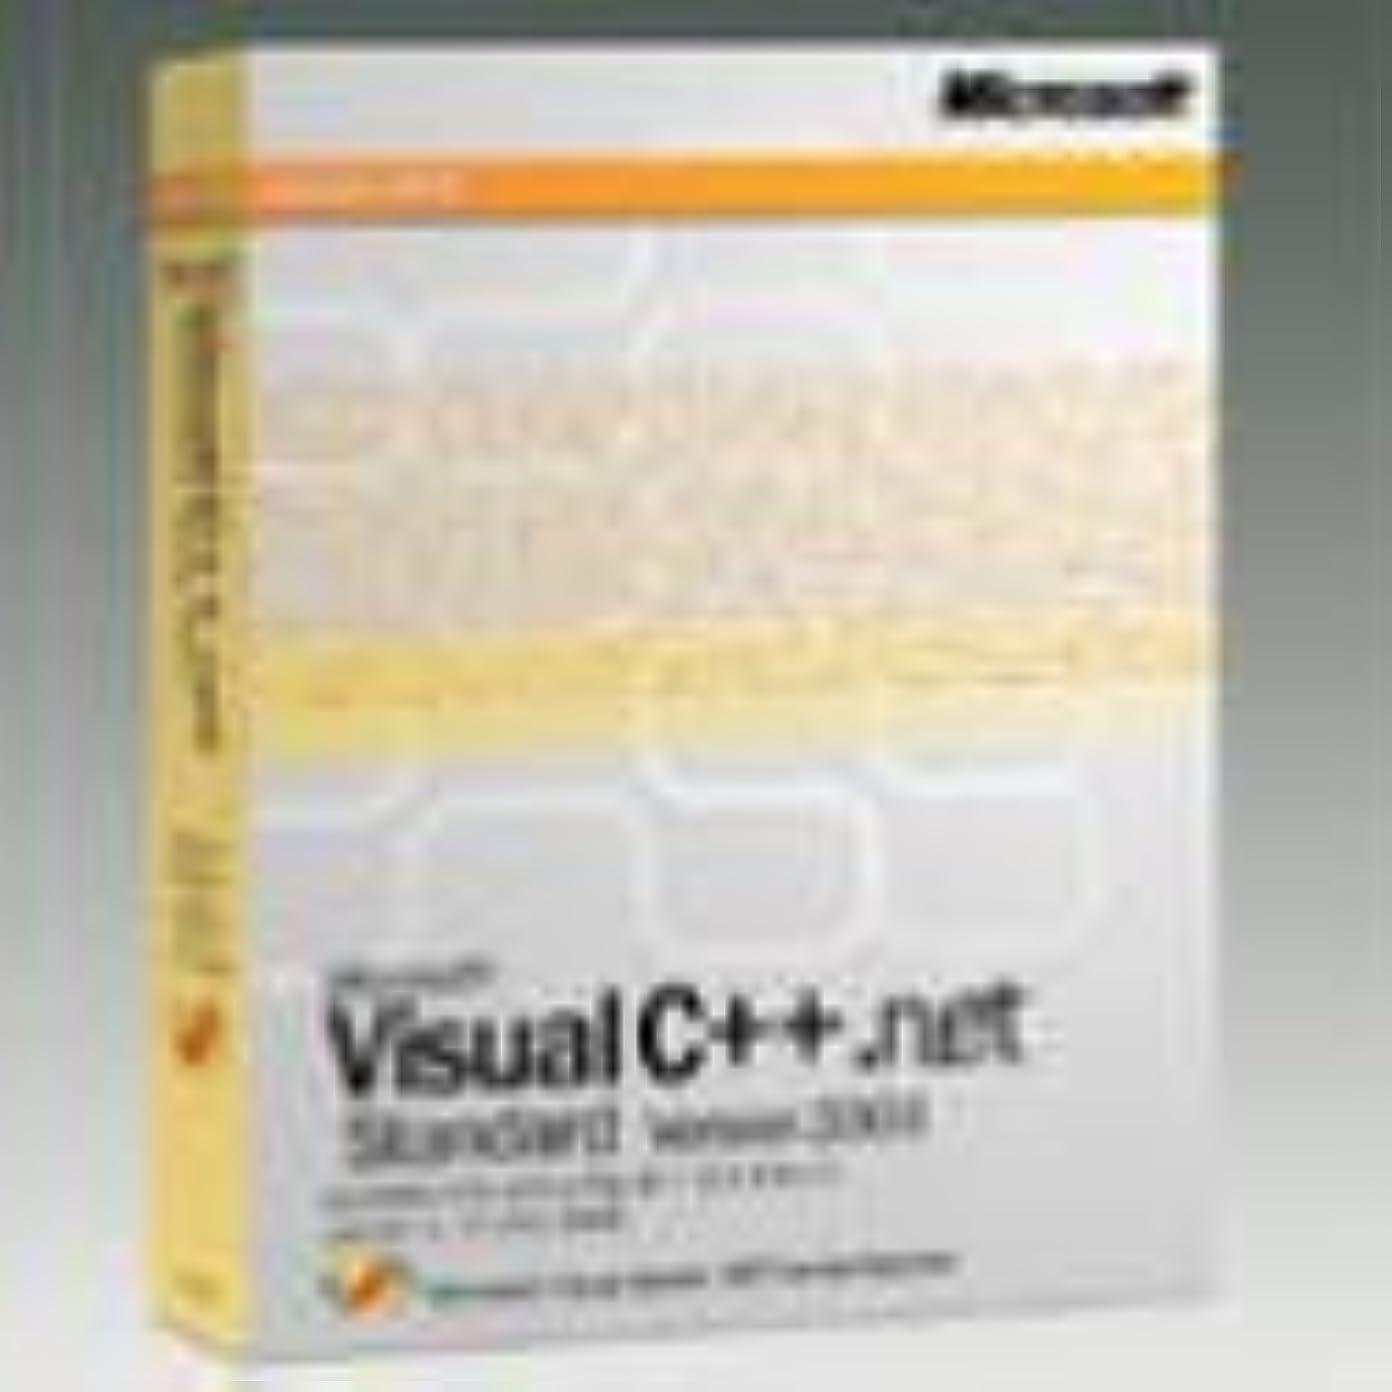 Microsoft Visual C++ .NET Standard Version 2003